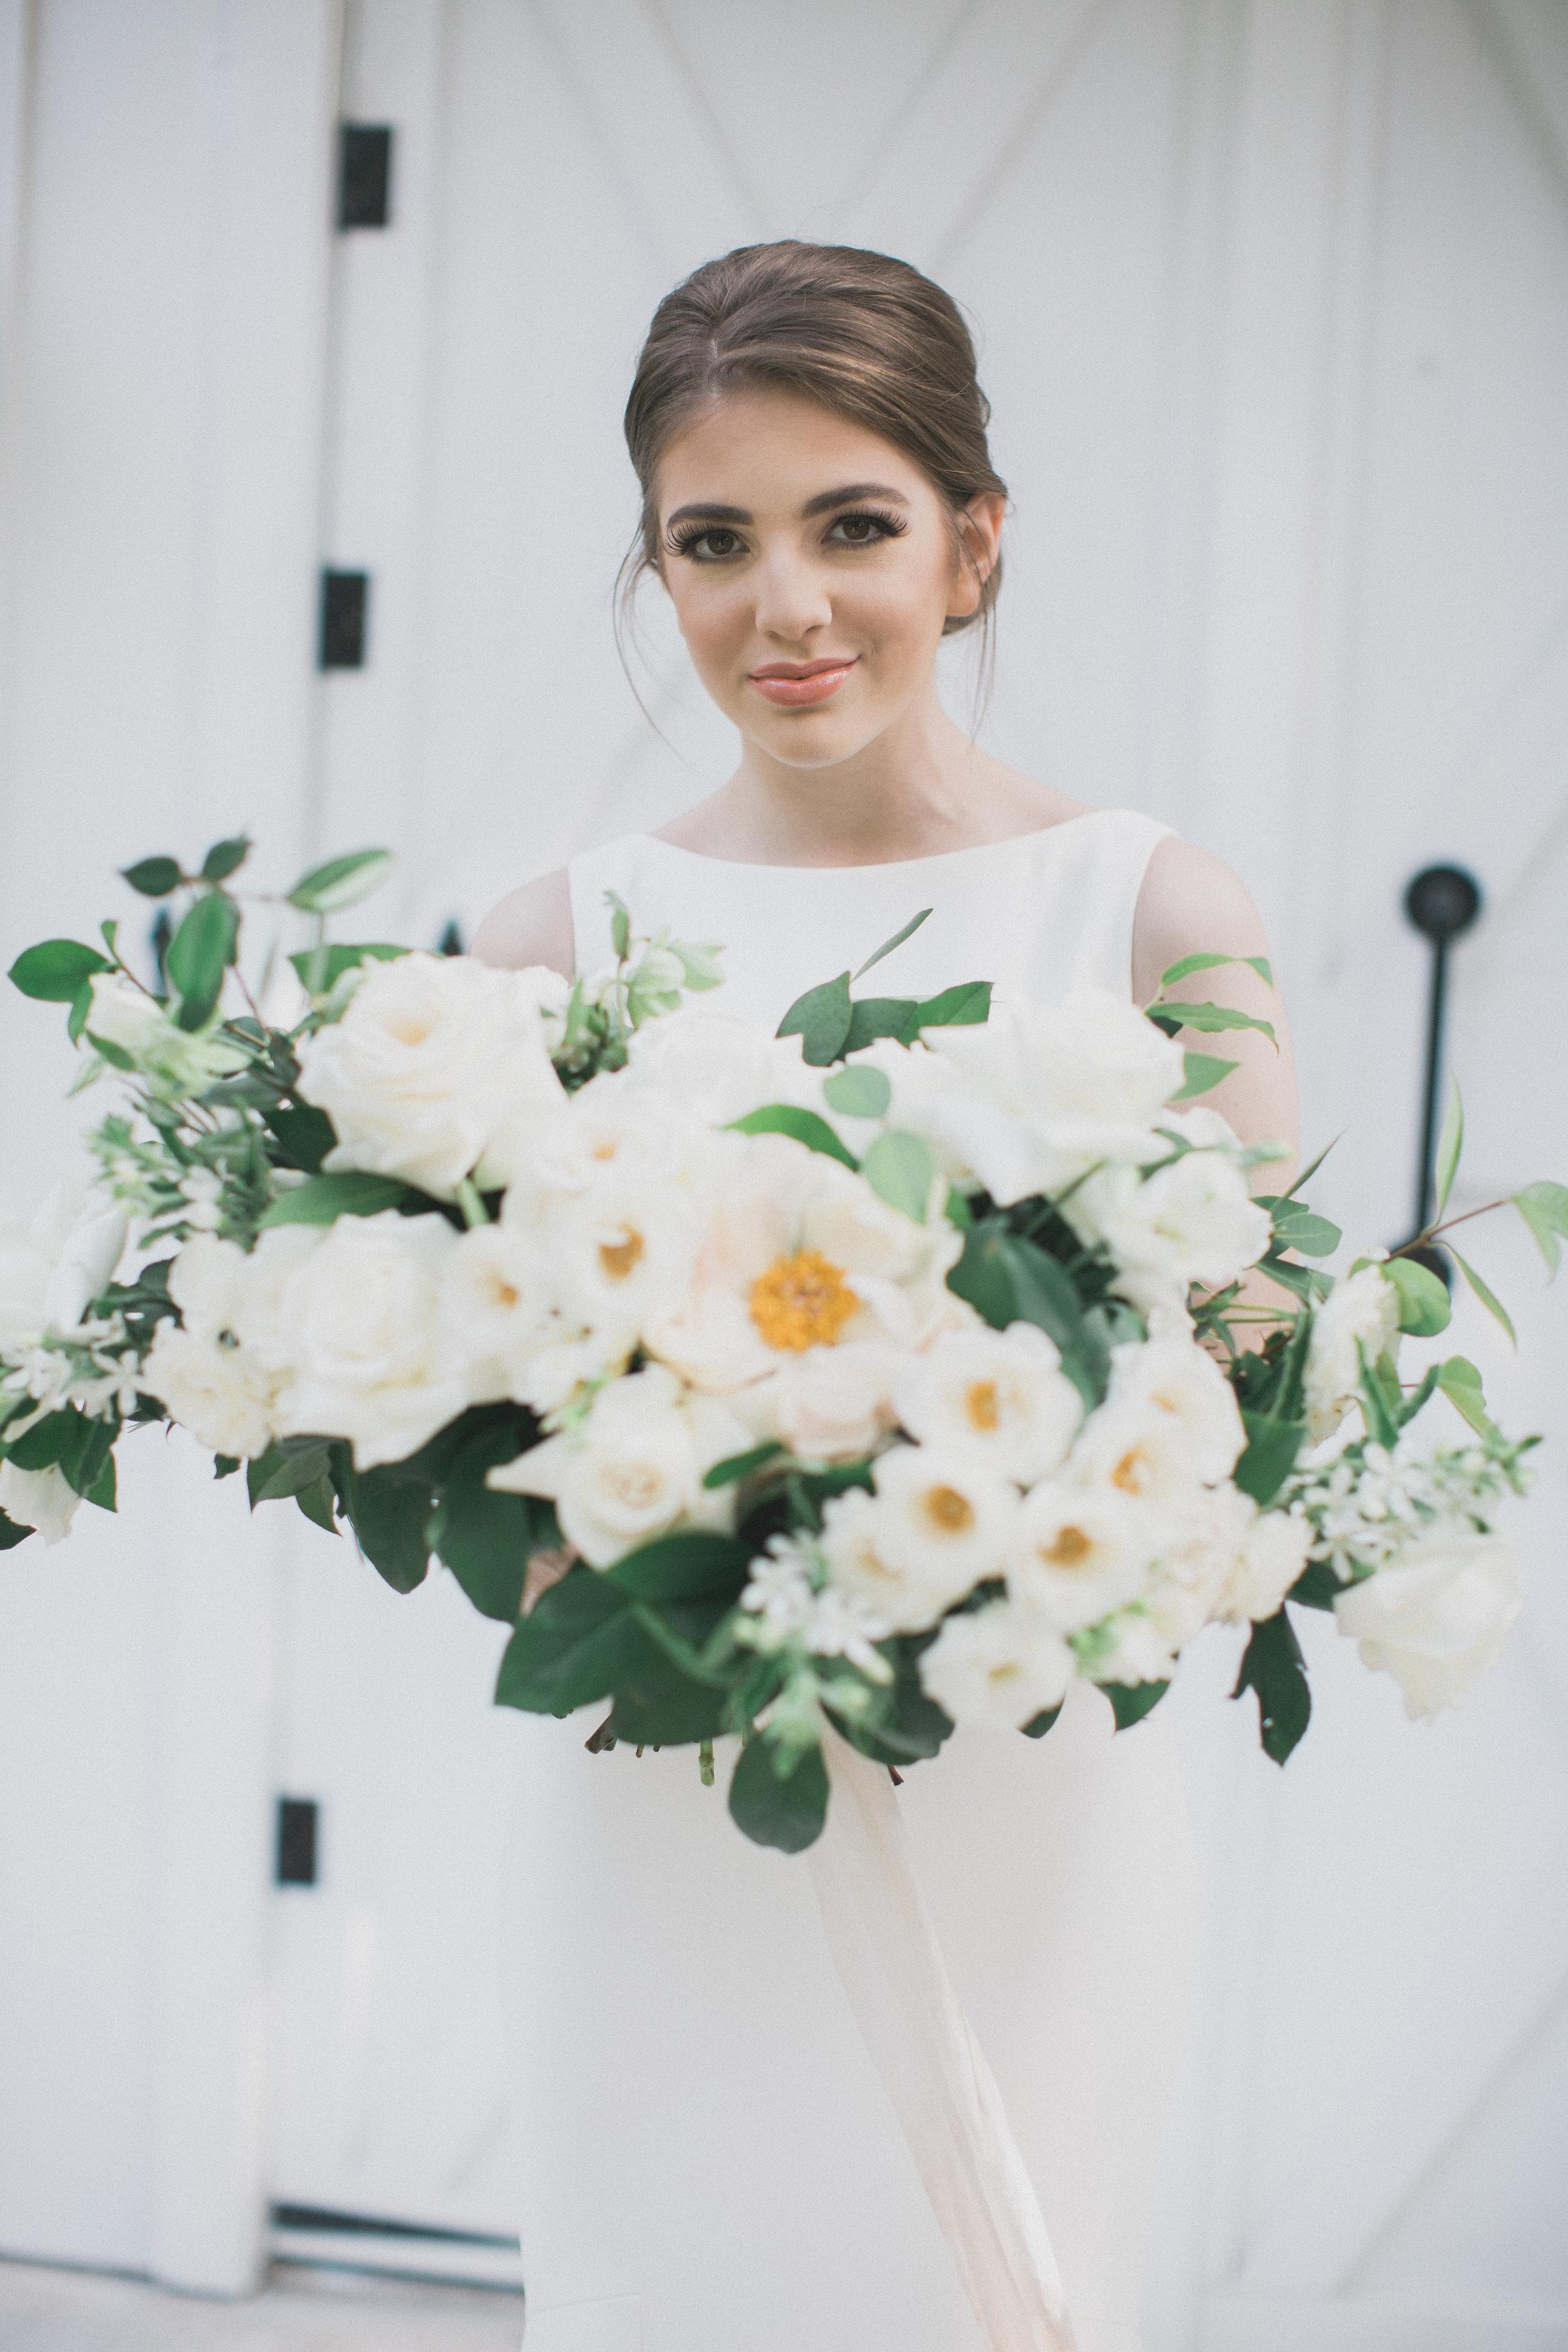 Bridal Hair and Makeup Inspiration | Southern Summer White Barn Wedding in Dallas, TX